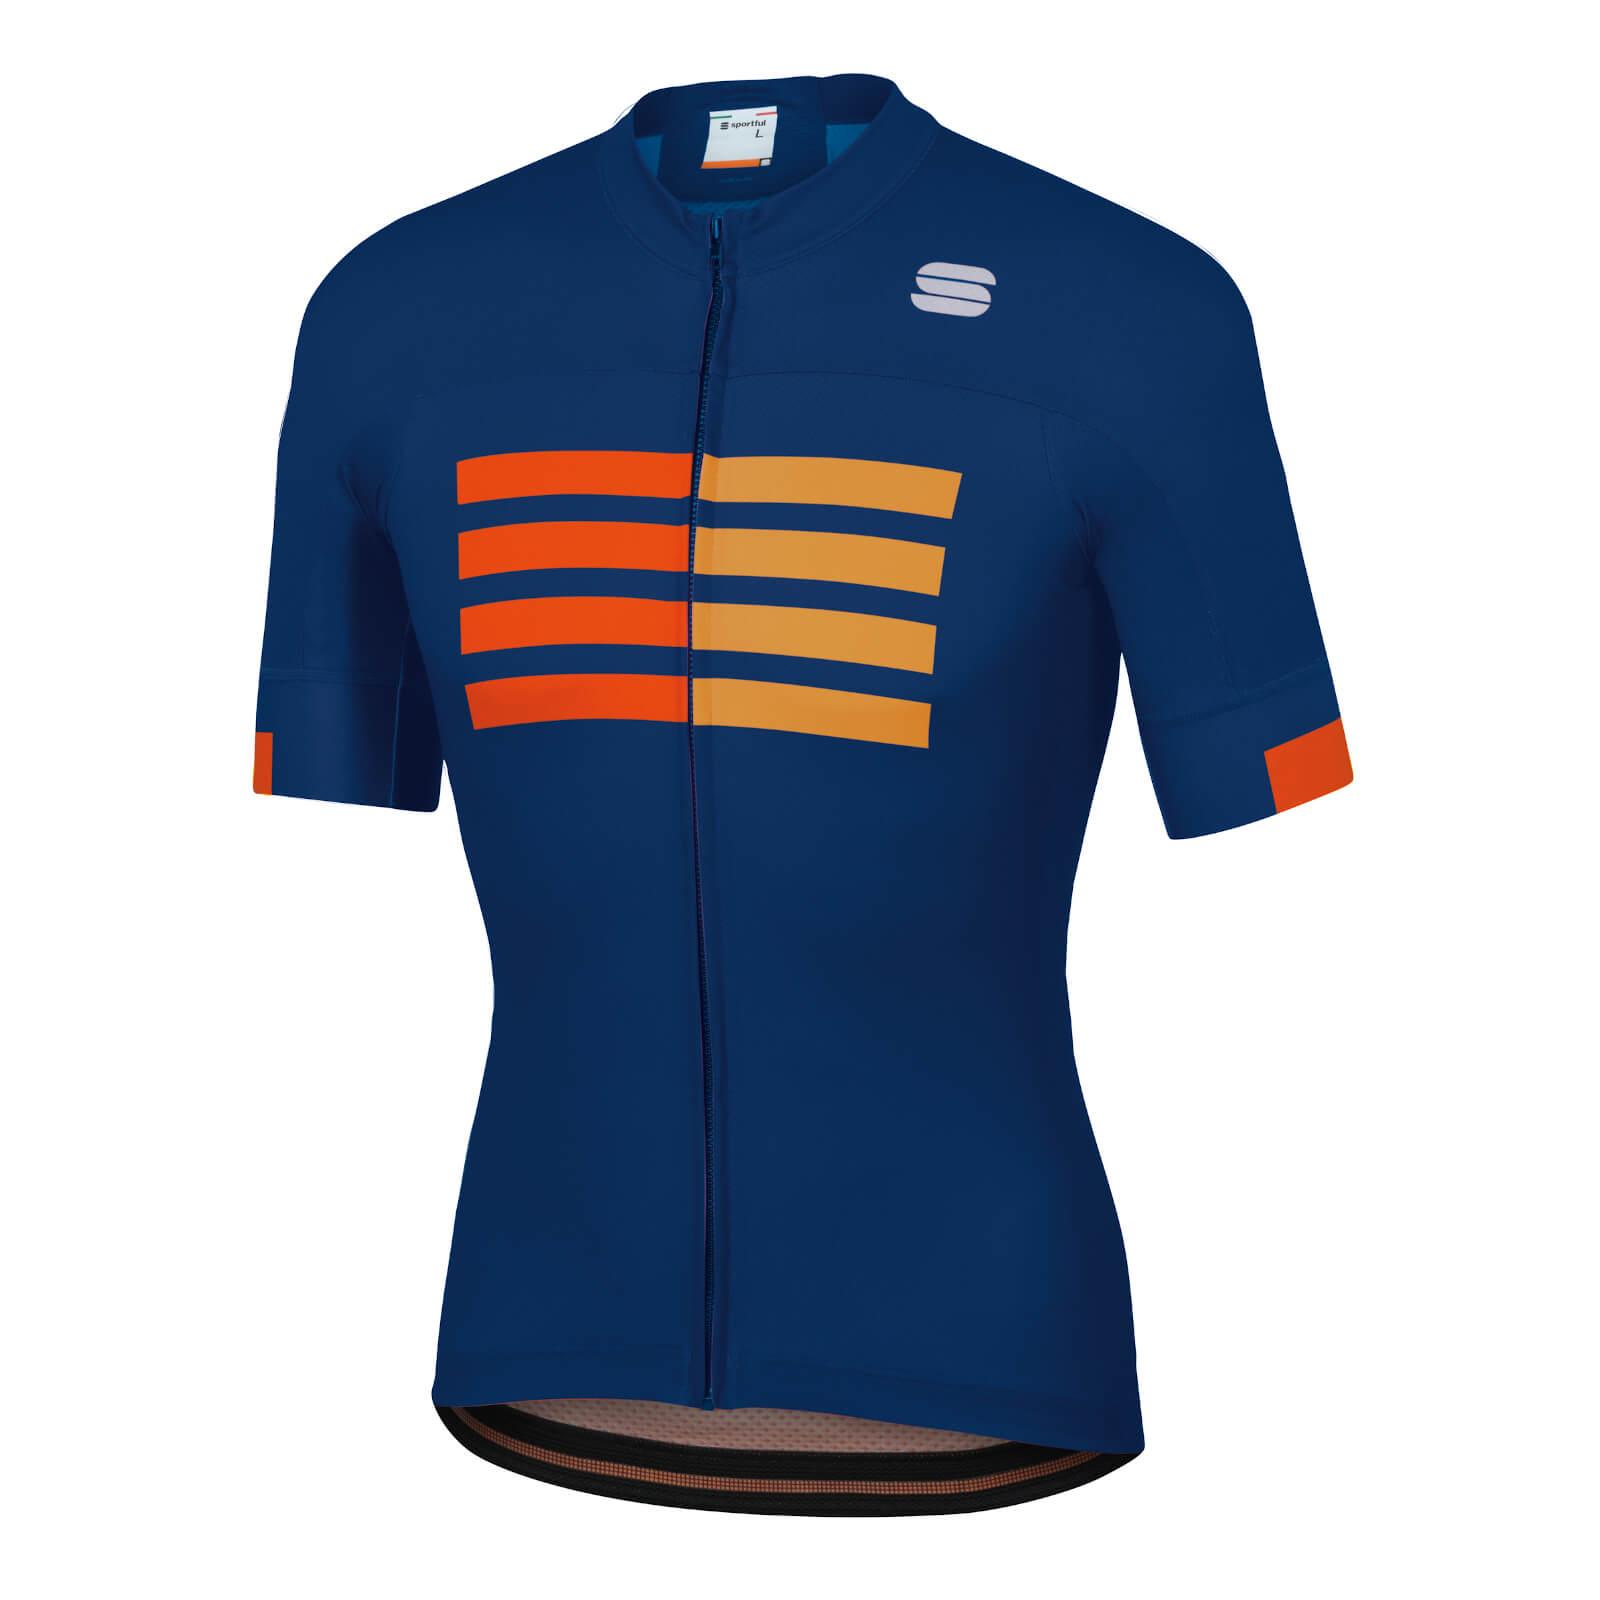 Sportful Wire Jersey - L - Blue Twilight/Fire Red/Gold